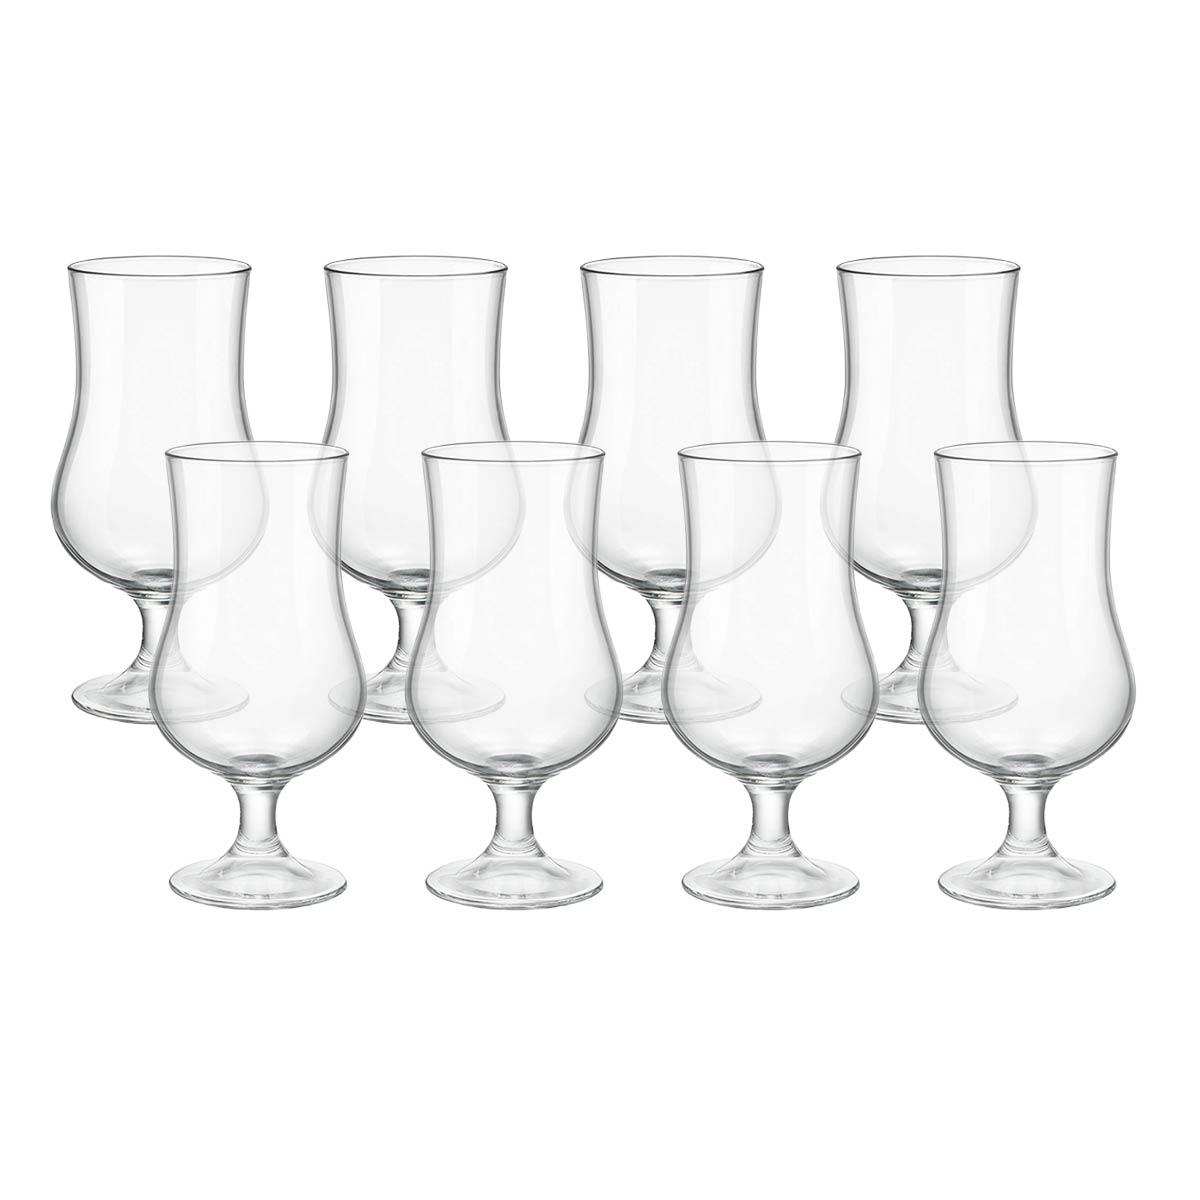 Kit 8 Taças Cerveja de Vidro Transparente 420 ml  - Lemis